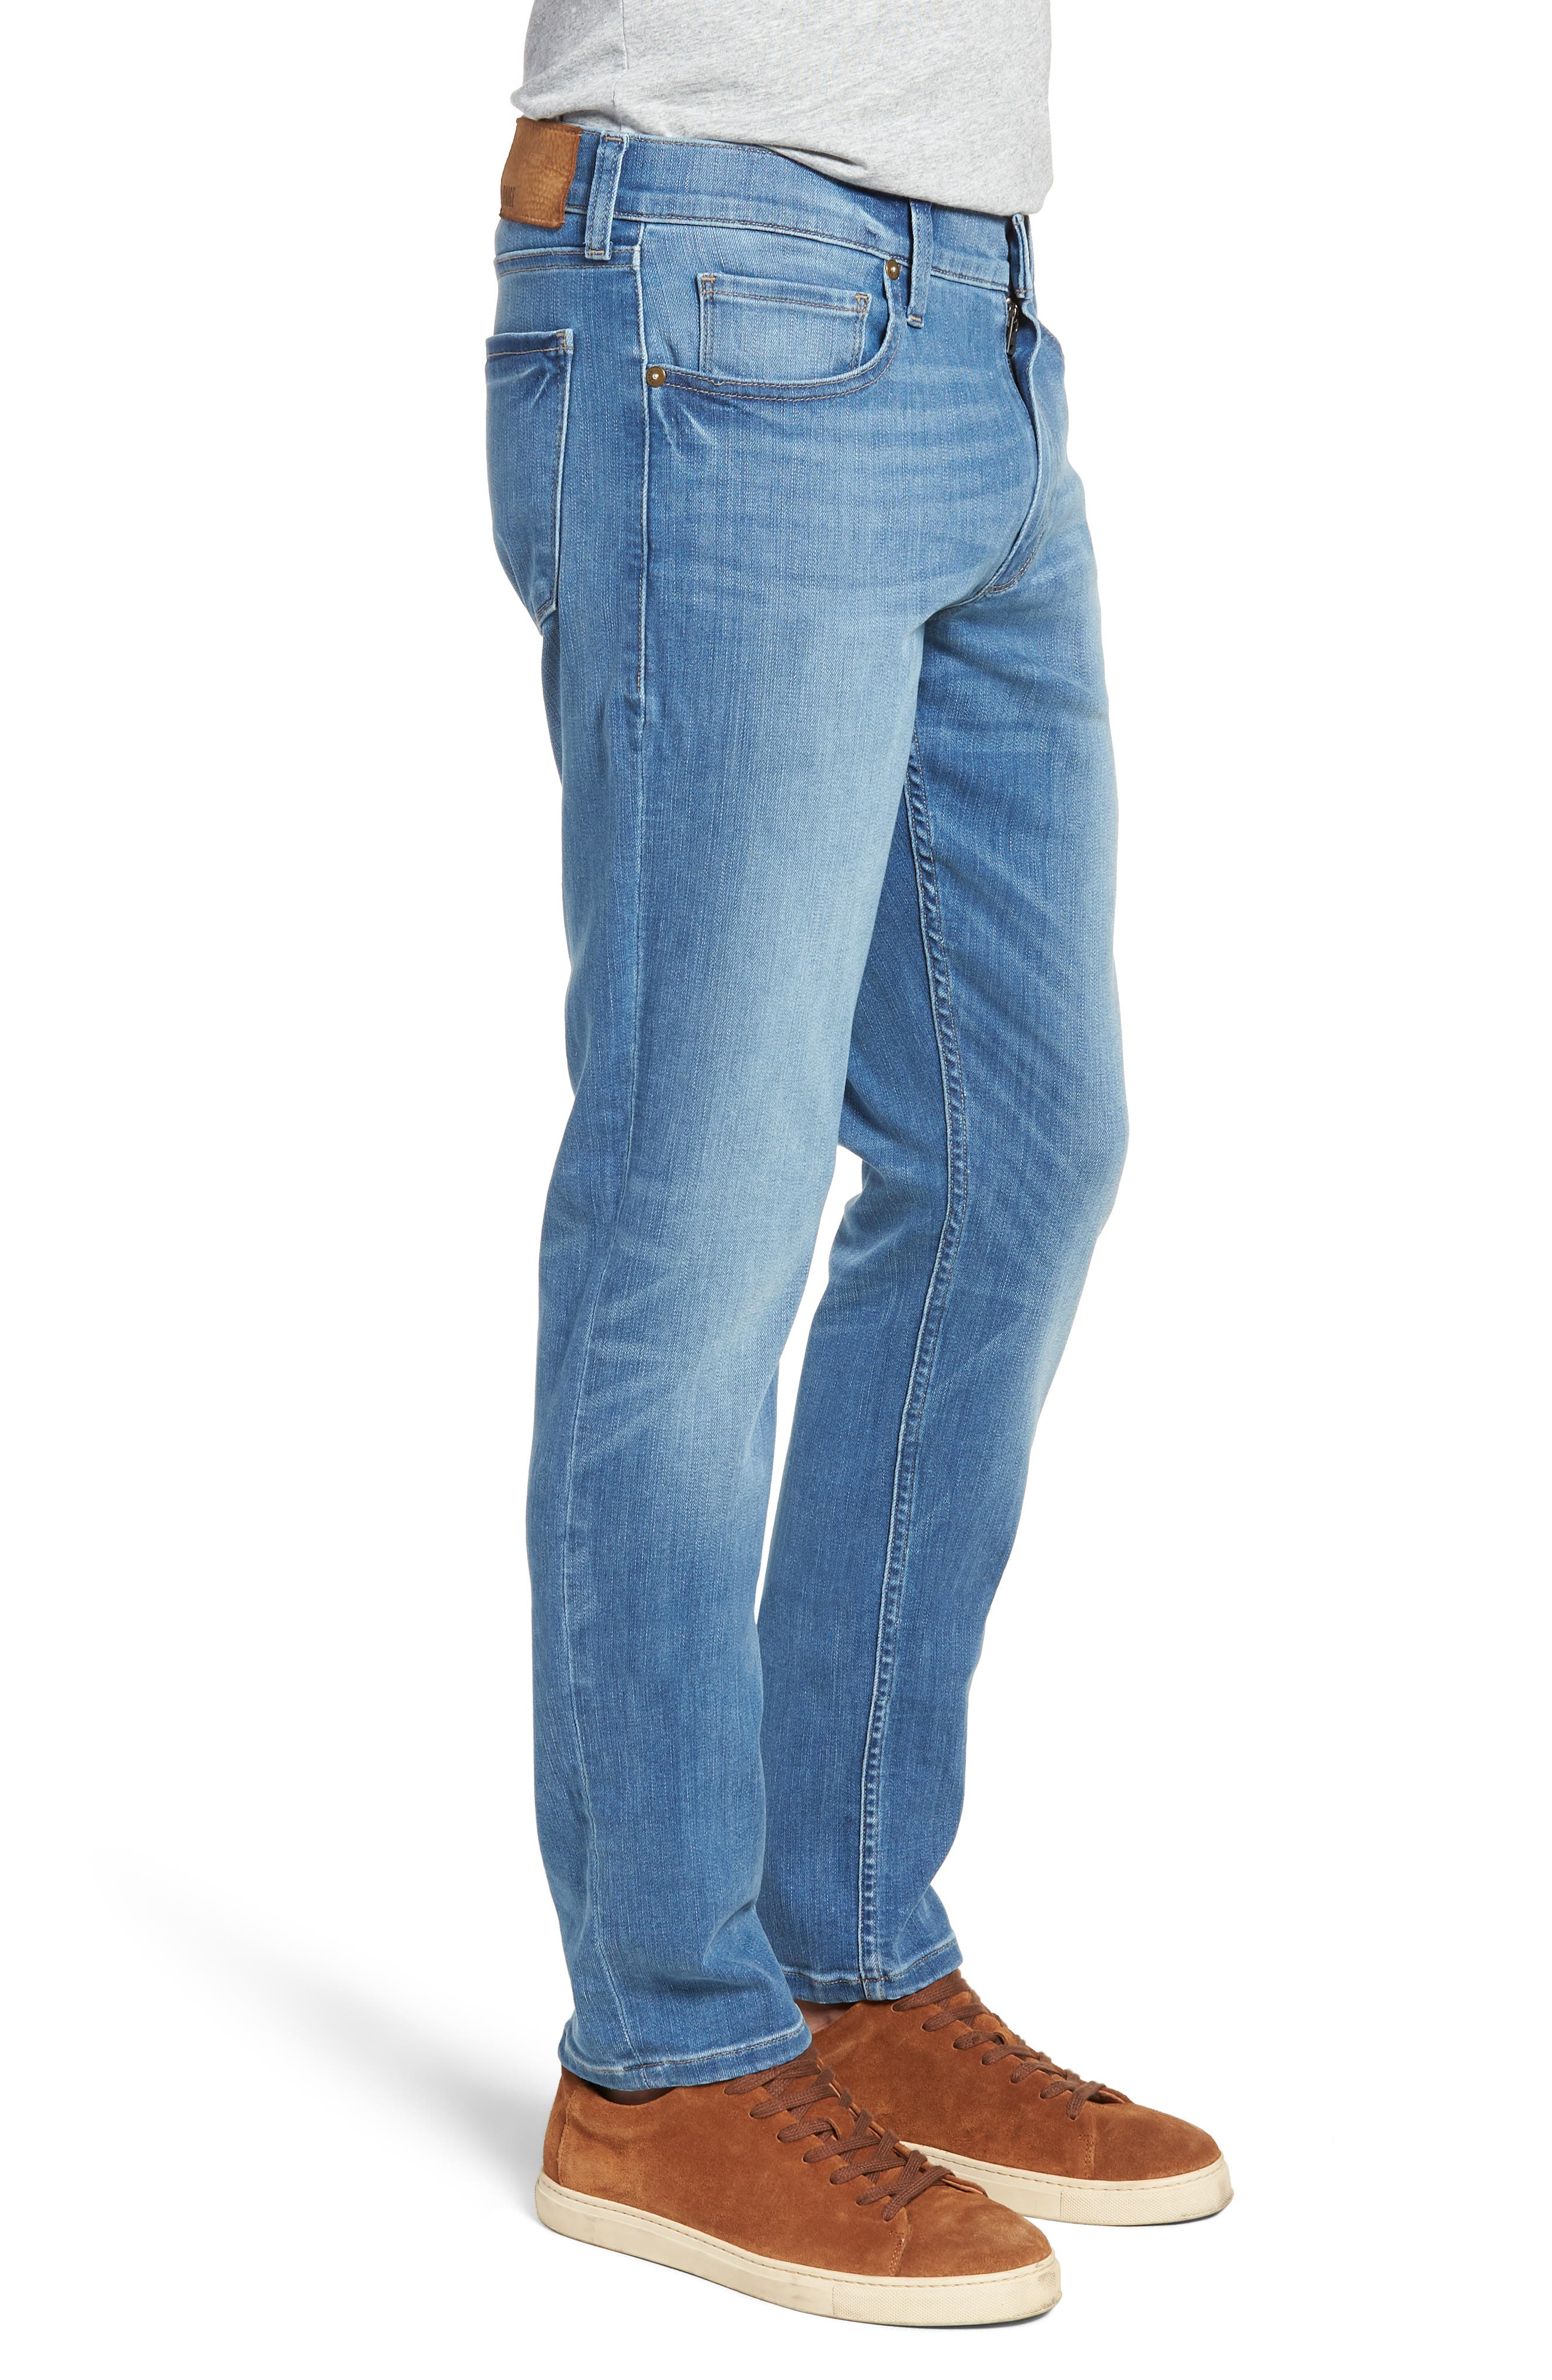 Transcend - Federal Slim Straight Leg Jeans,                             Alternate thumbnail 3, color,                             HAMMONDS